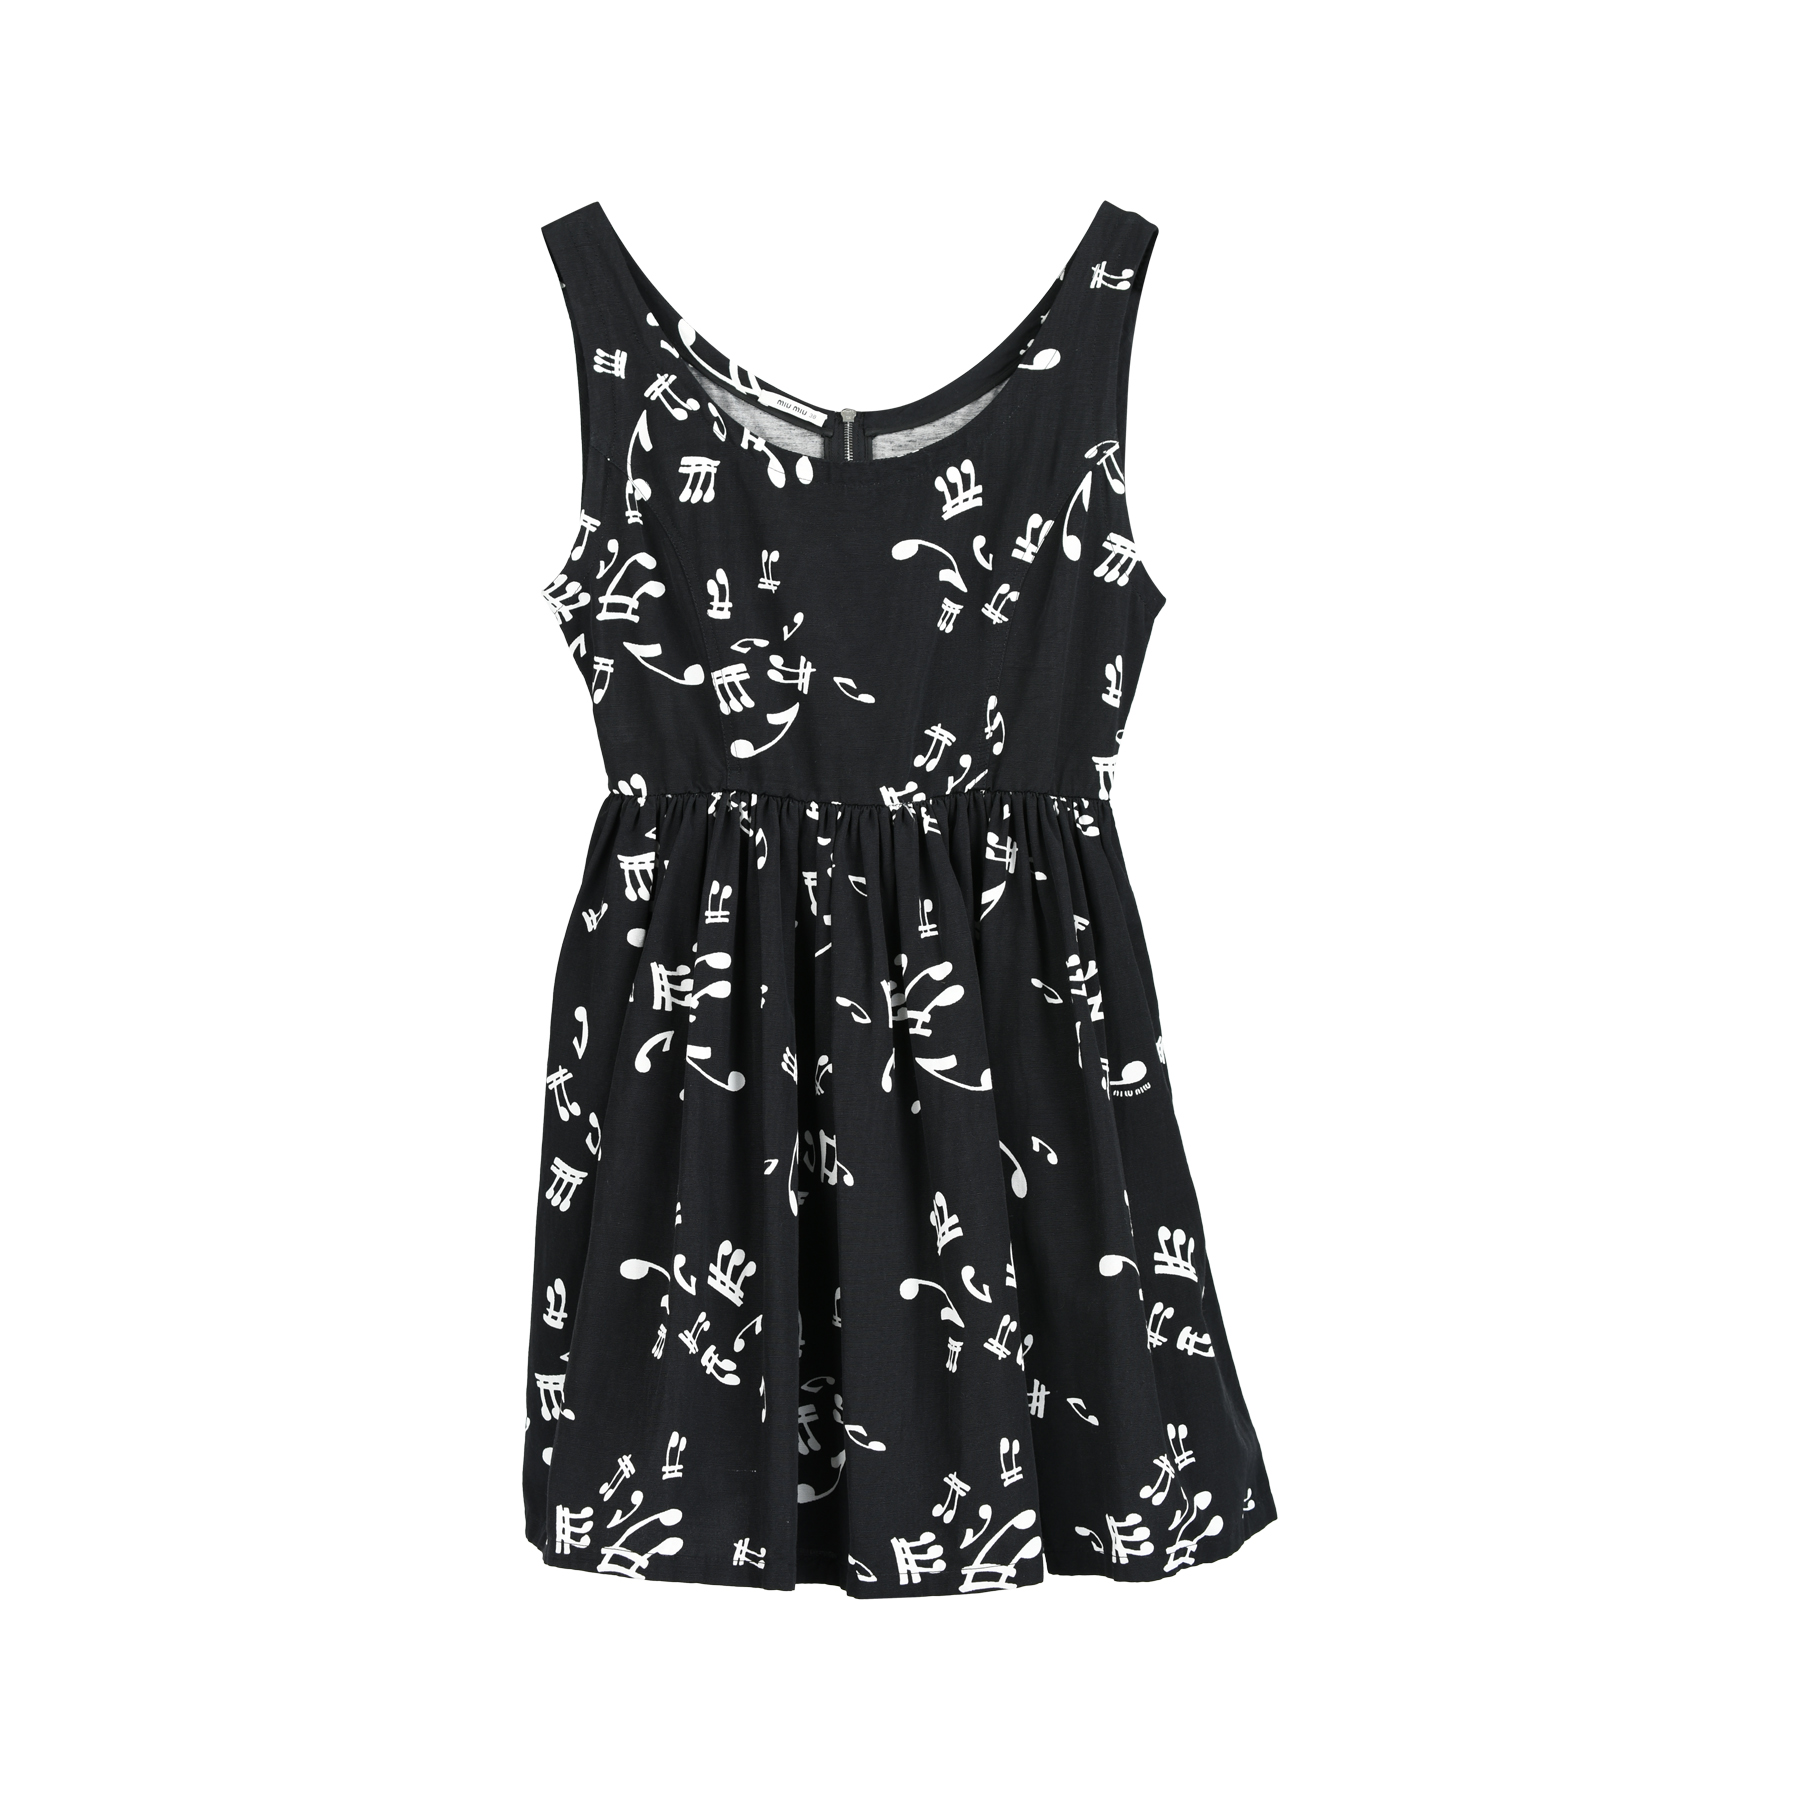 3a9feeccbc604 Authentic Second Hand Miu Miu Silk Faille Music Notes Dress (PSS-235-00136)